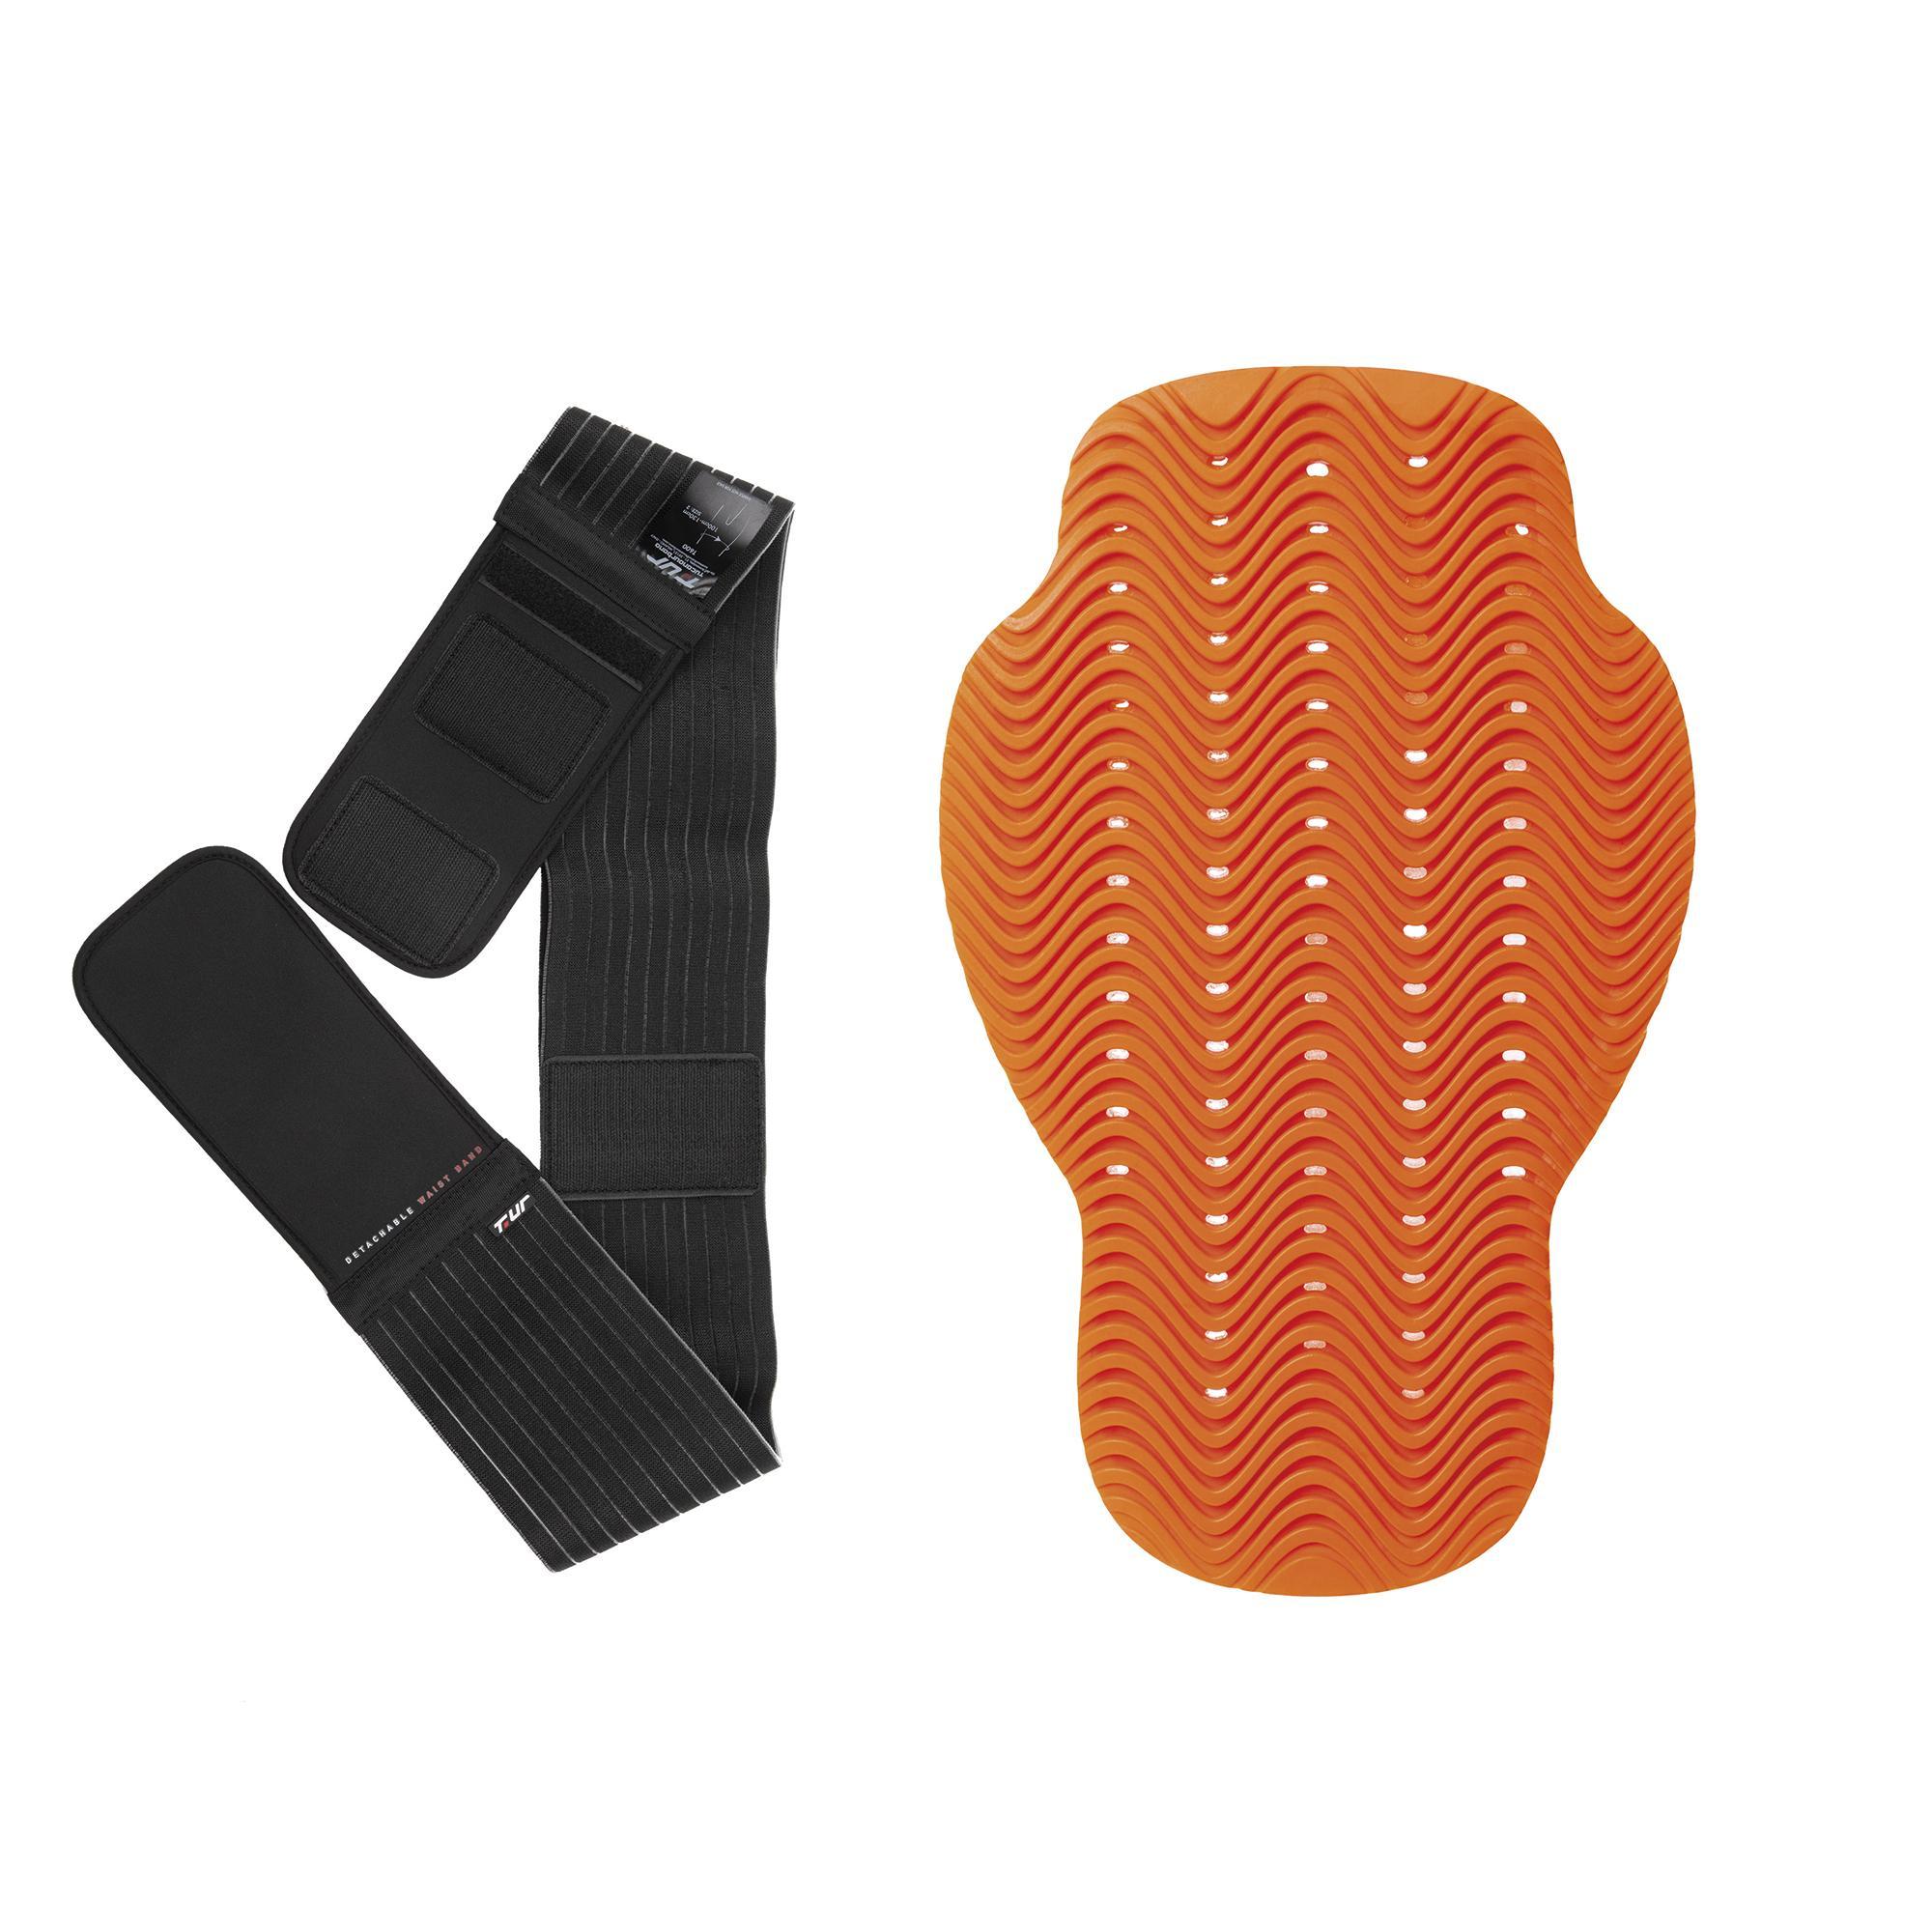 Kit Safety-support System Black